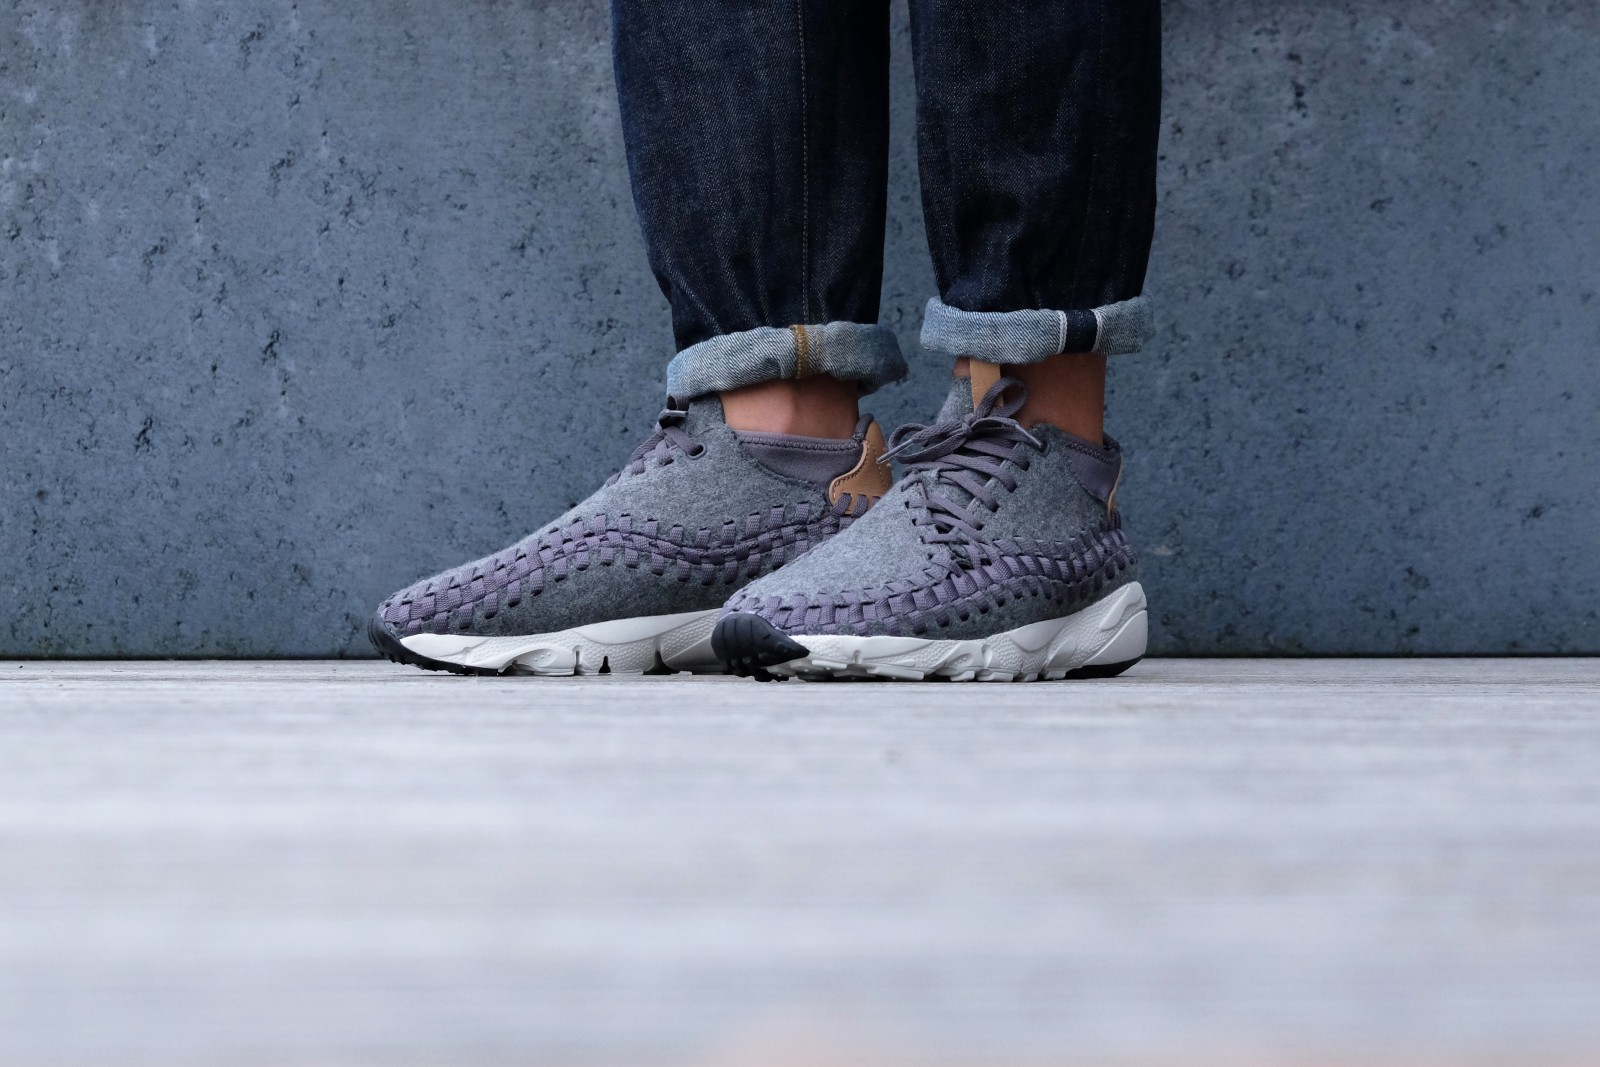 Nike Air Footscape Woven Chukka SE Grey 857874 002